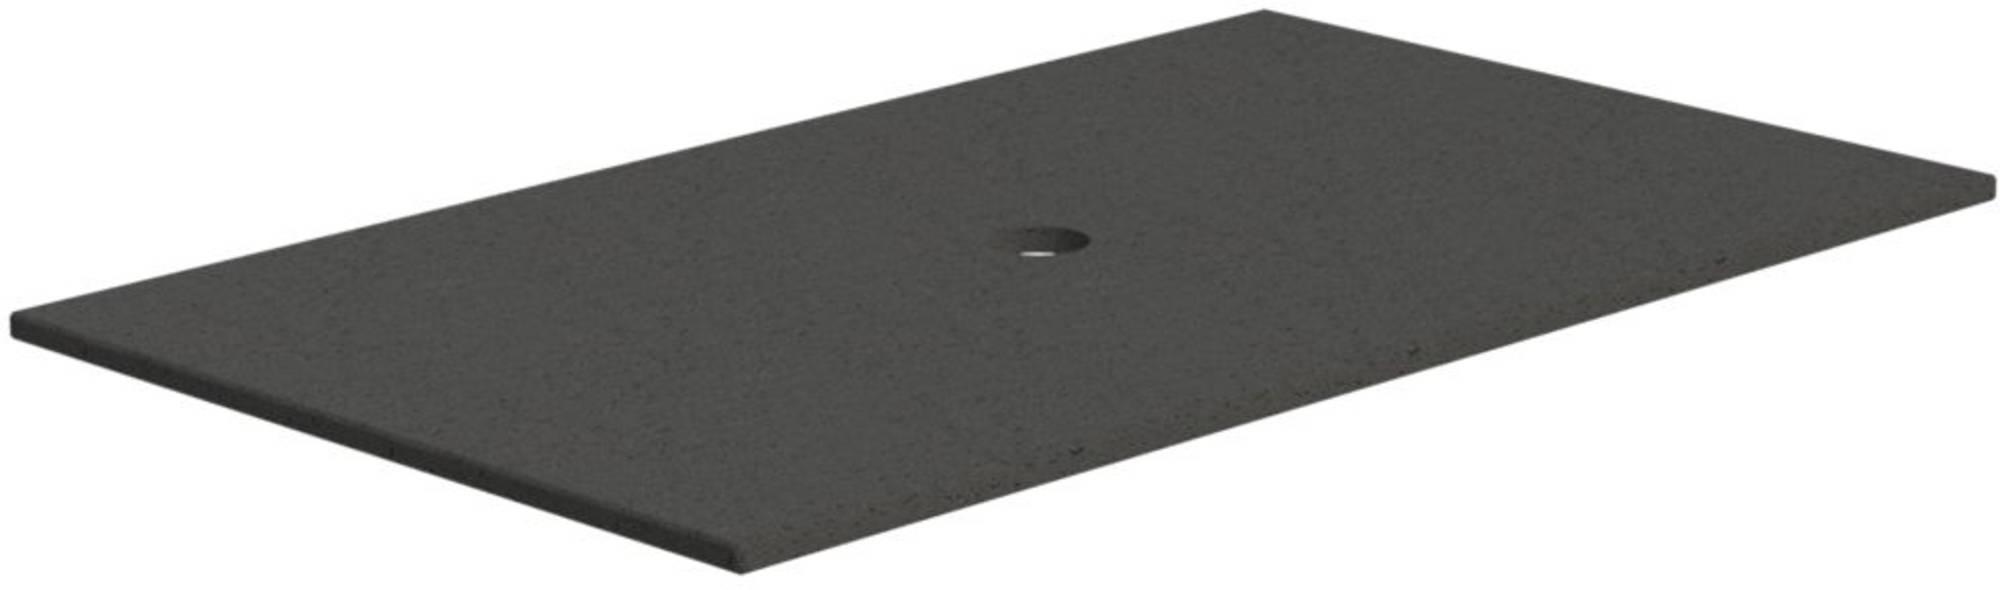 Thebalux Stone 3-4-5 Afdekblad Composiet 80x48,5x2 cm Cement Grigio Satin